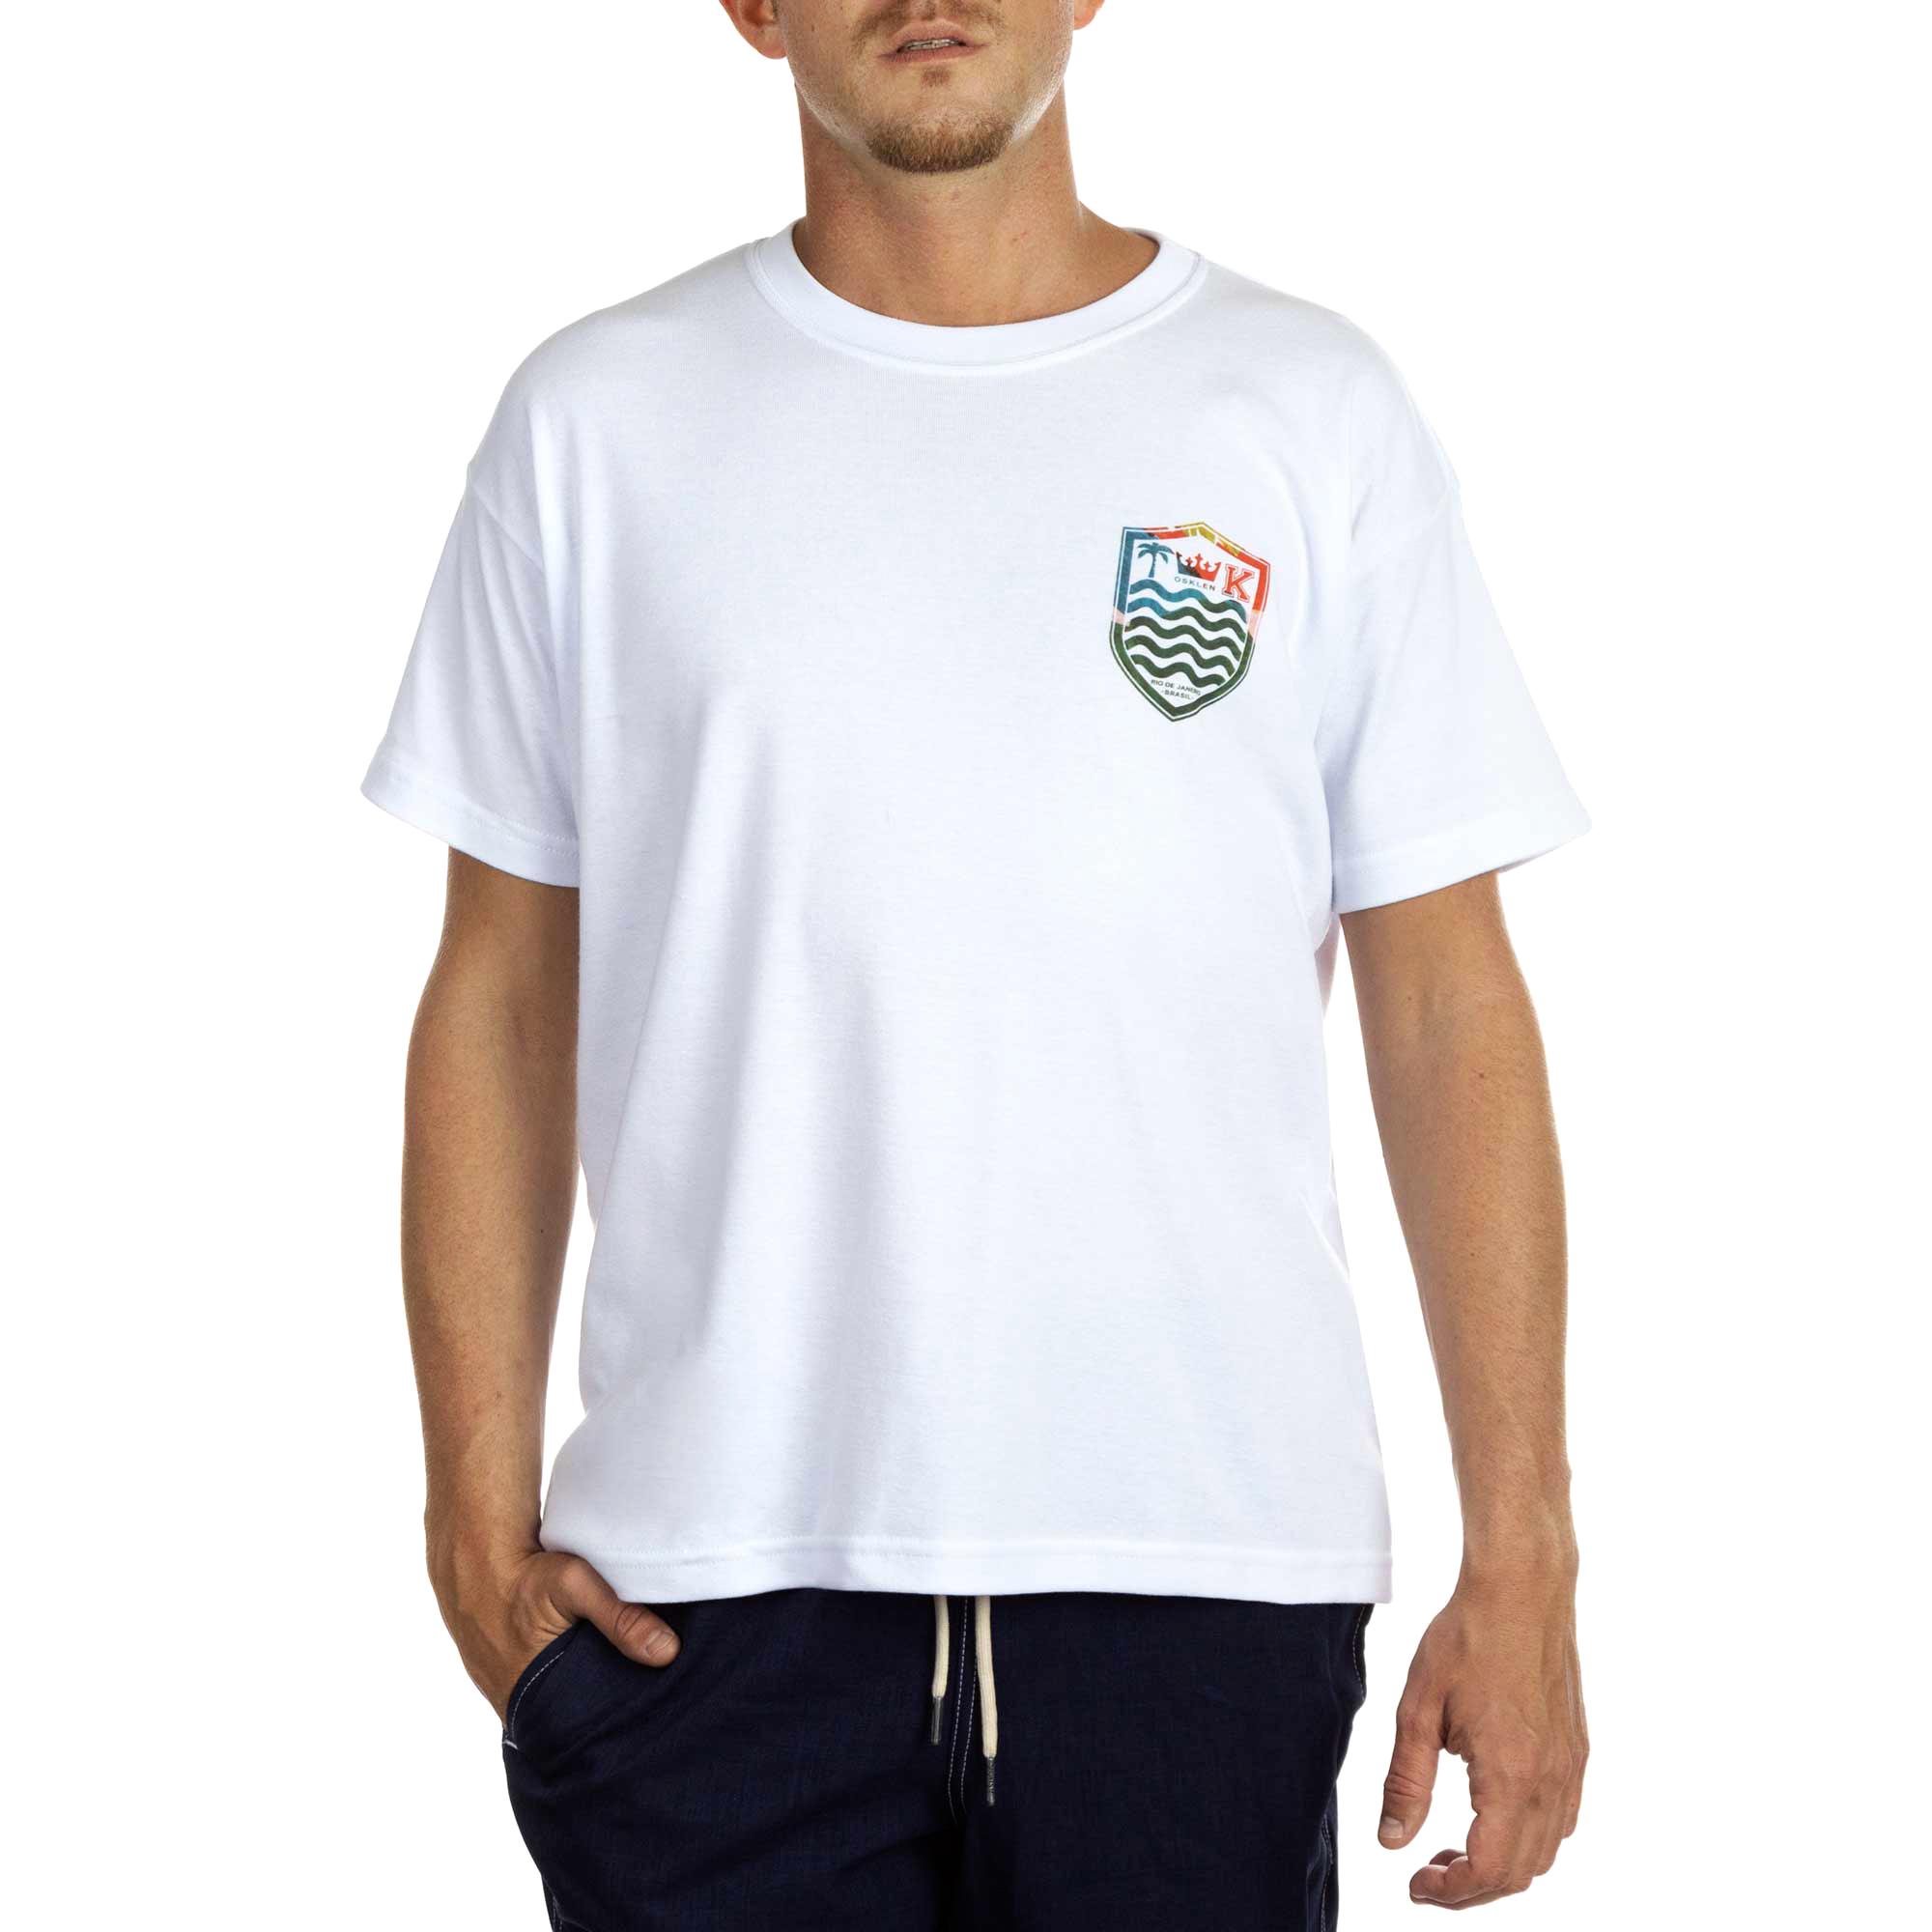 Osklen Camiseta  Big Shirt Hidrocolor Brasão Masculino Branco